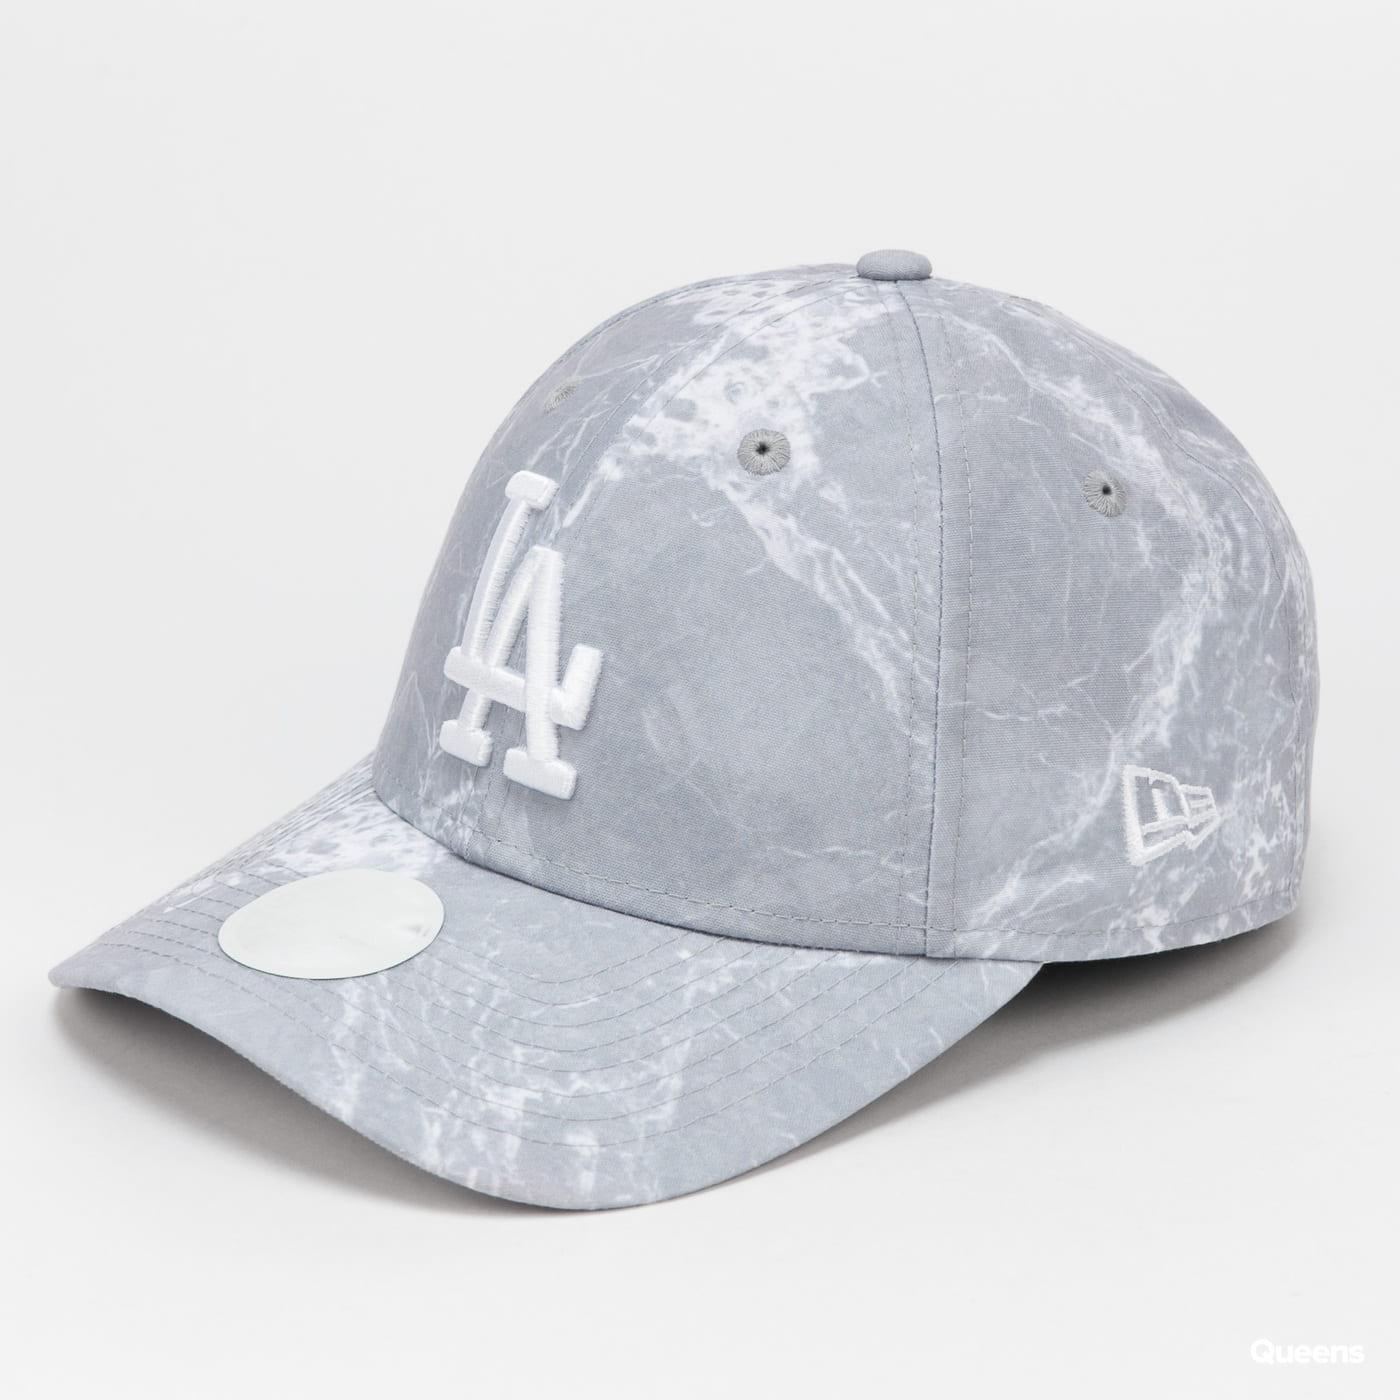 New Era 940W MLB WMNS Marble LA gray / white